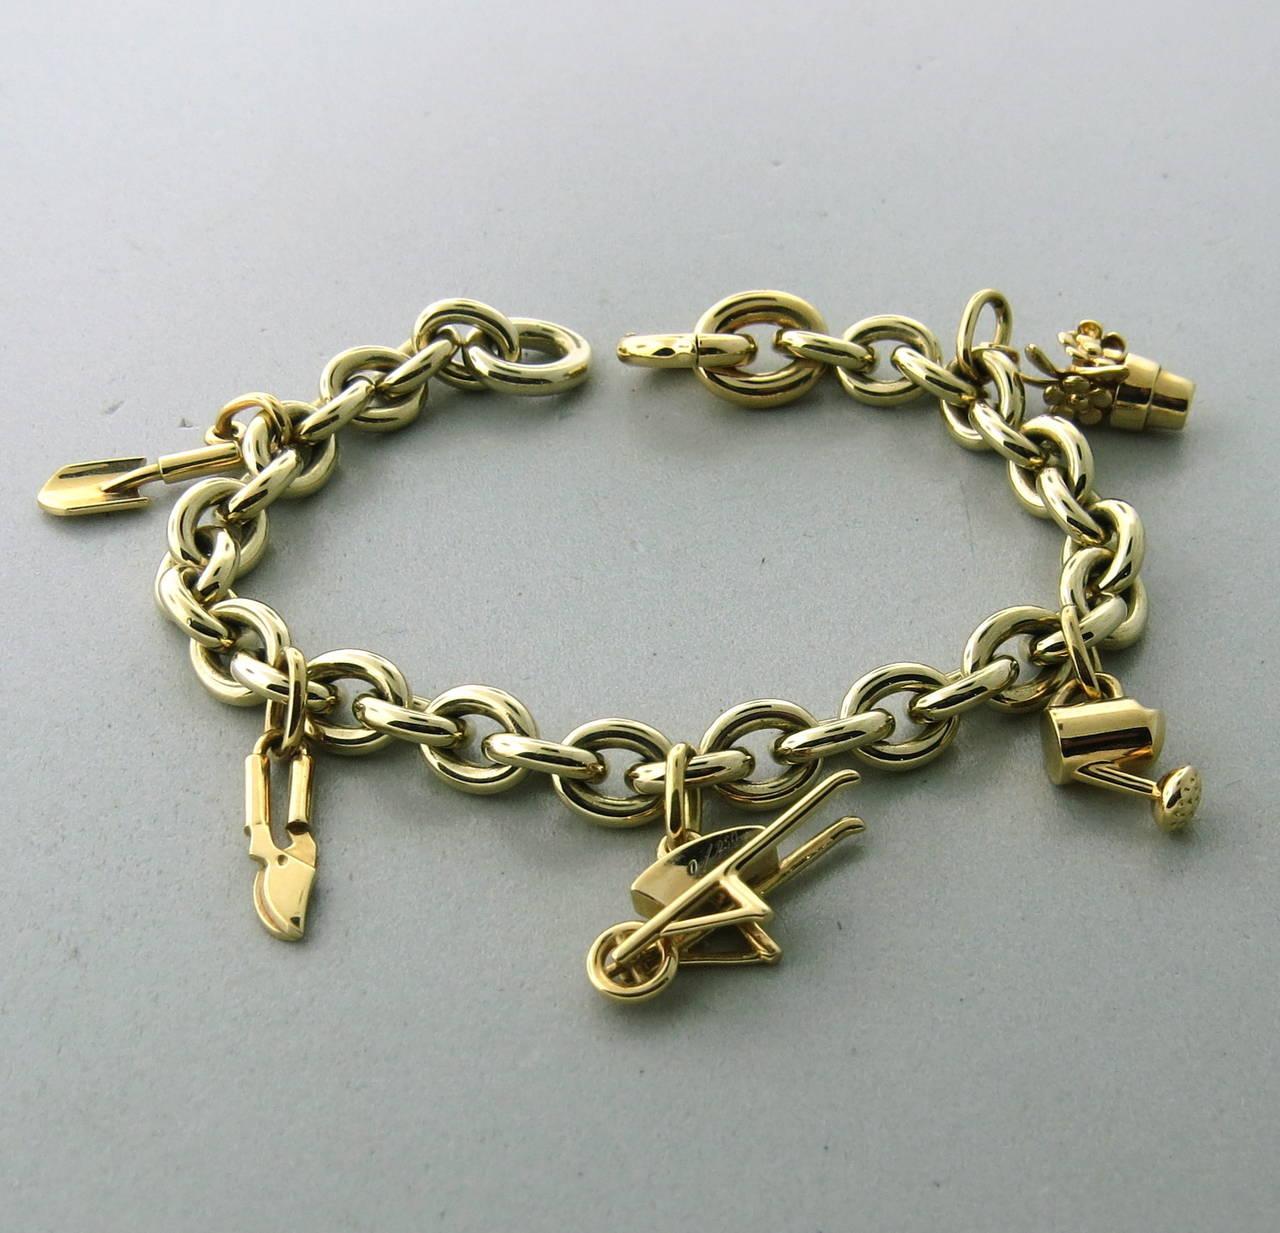 Garden Charm Bracelet Charm Bracelet Image 2